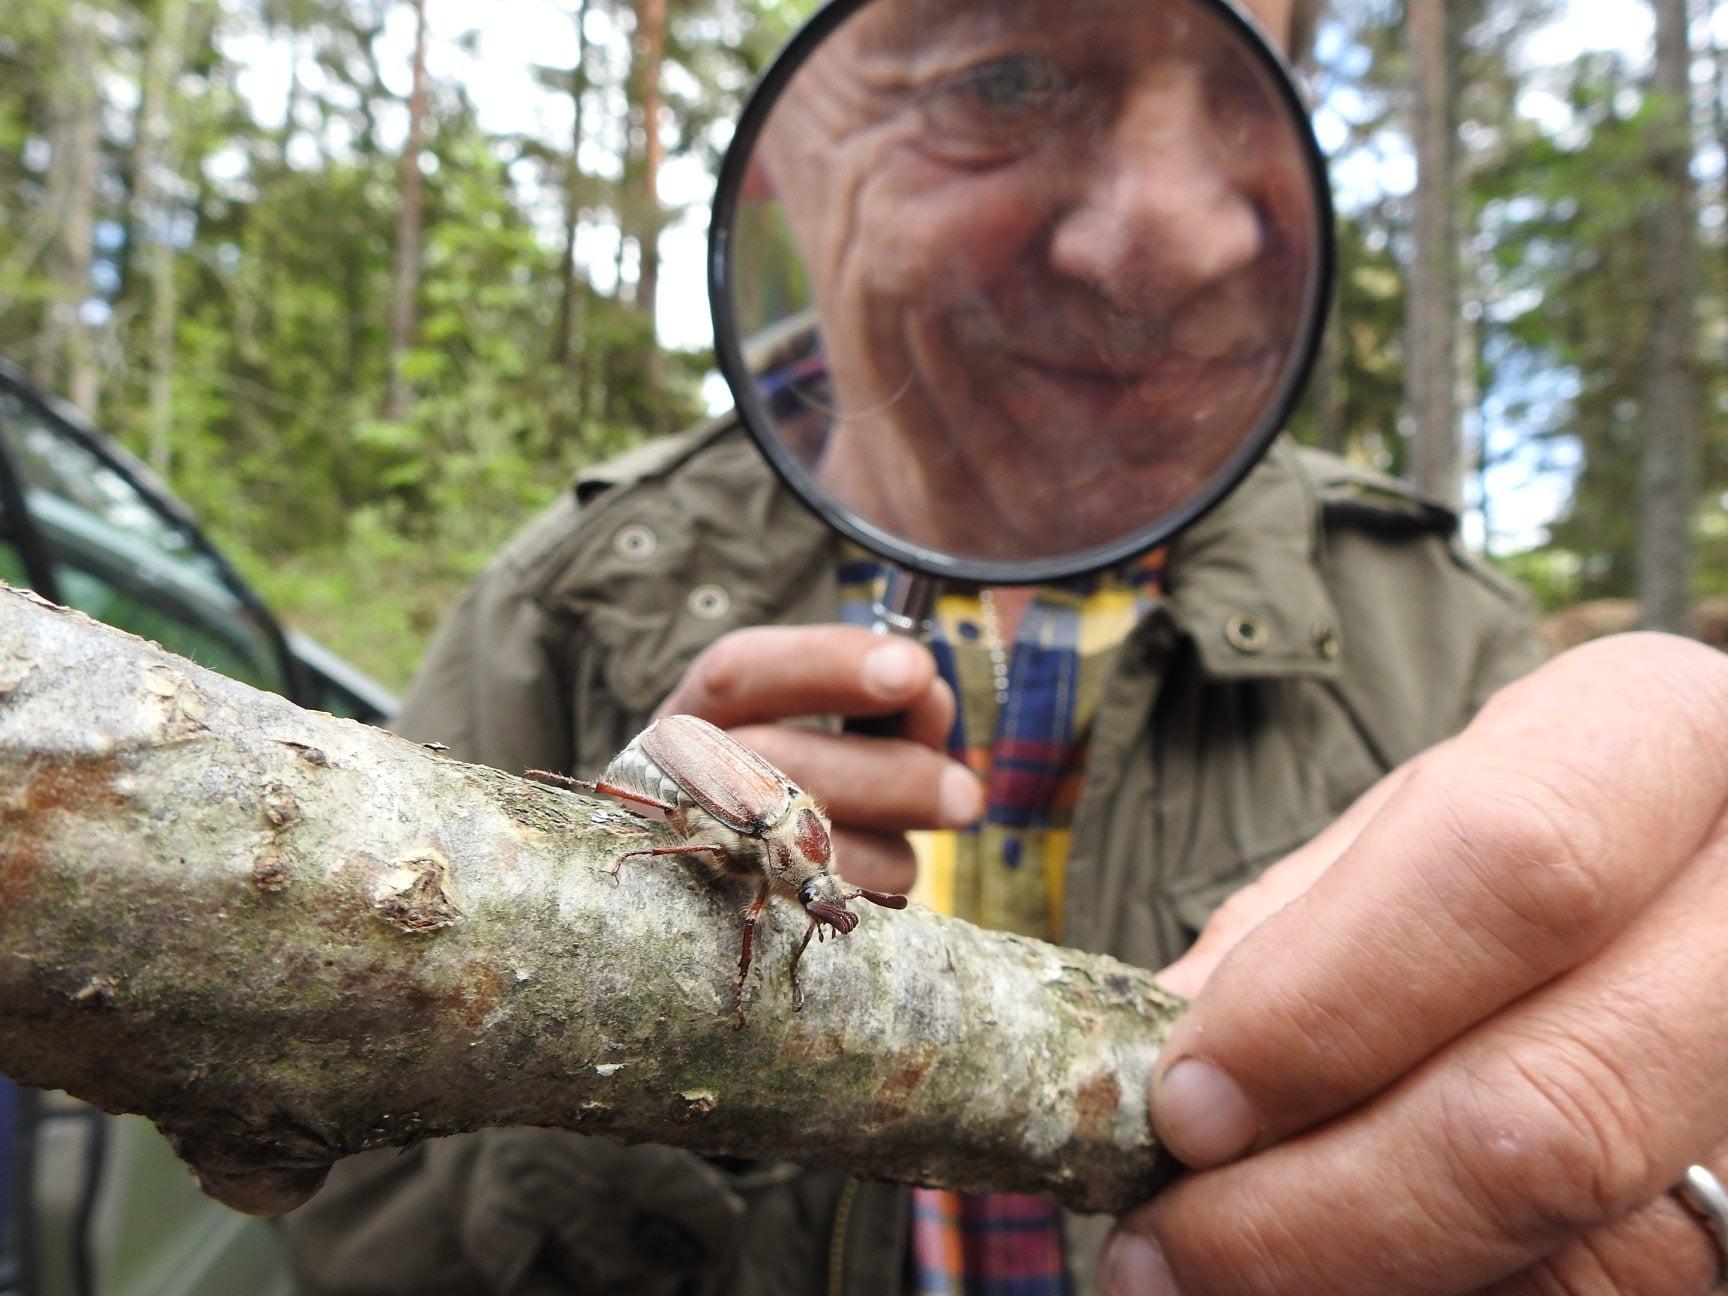 Terrestrial plant, Hand, Vertebrate, Tree, Wood, Finger, Smile